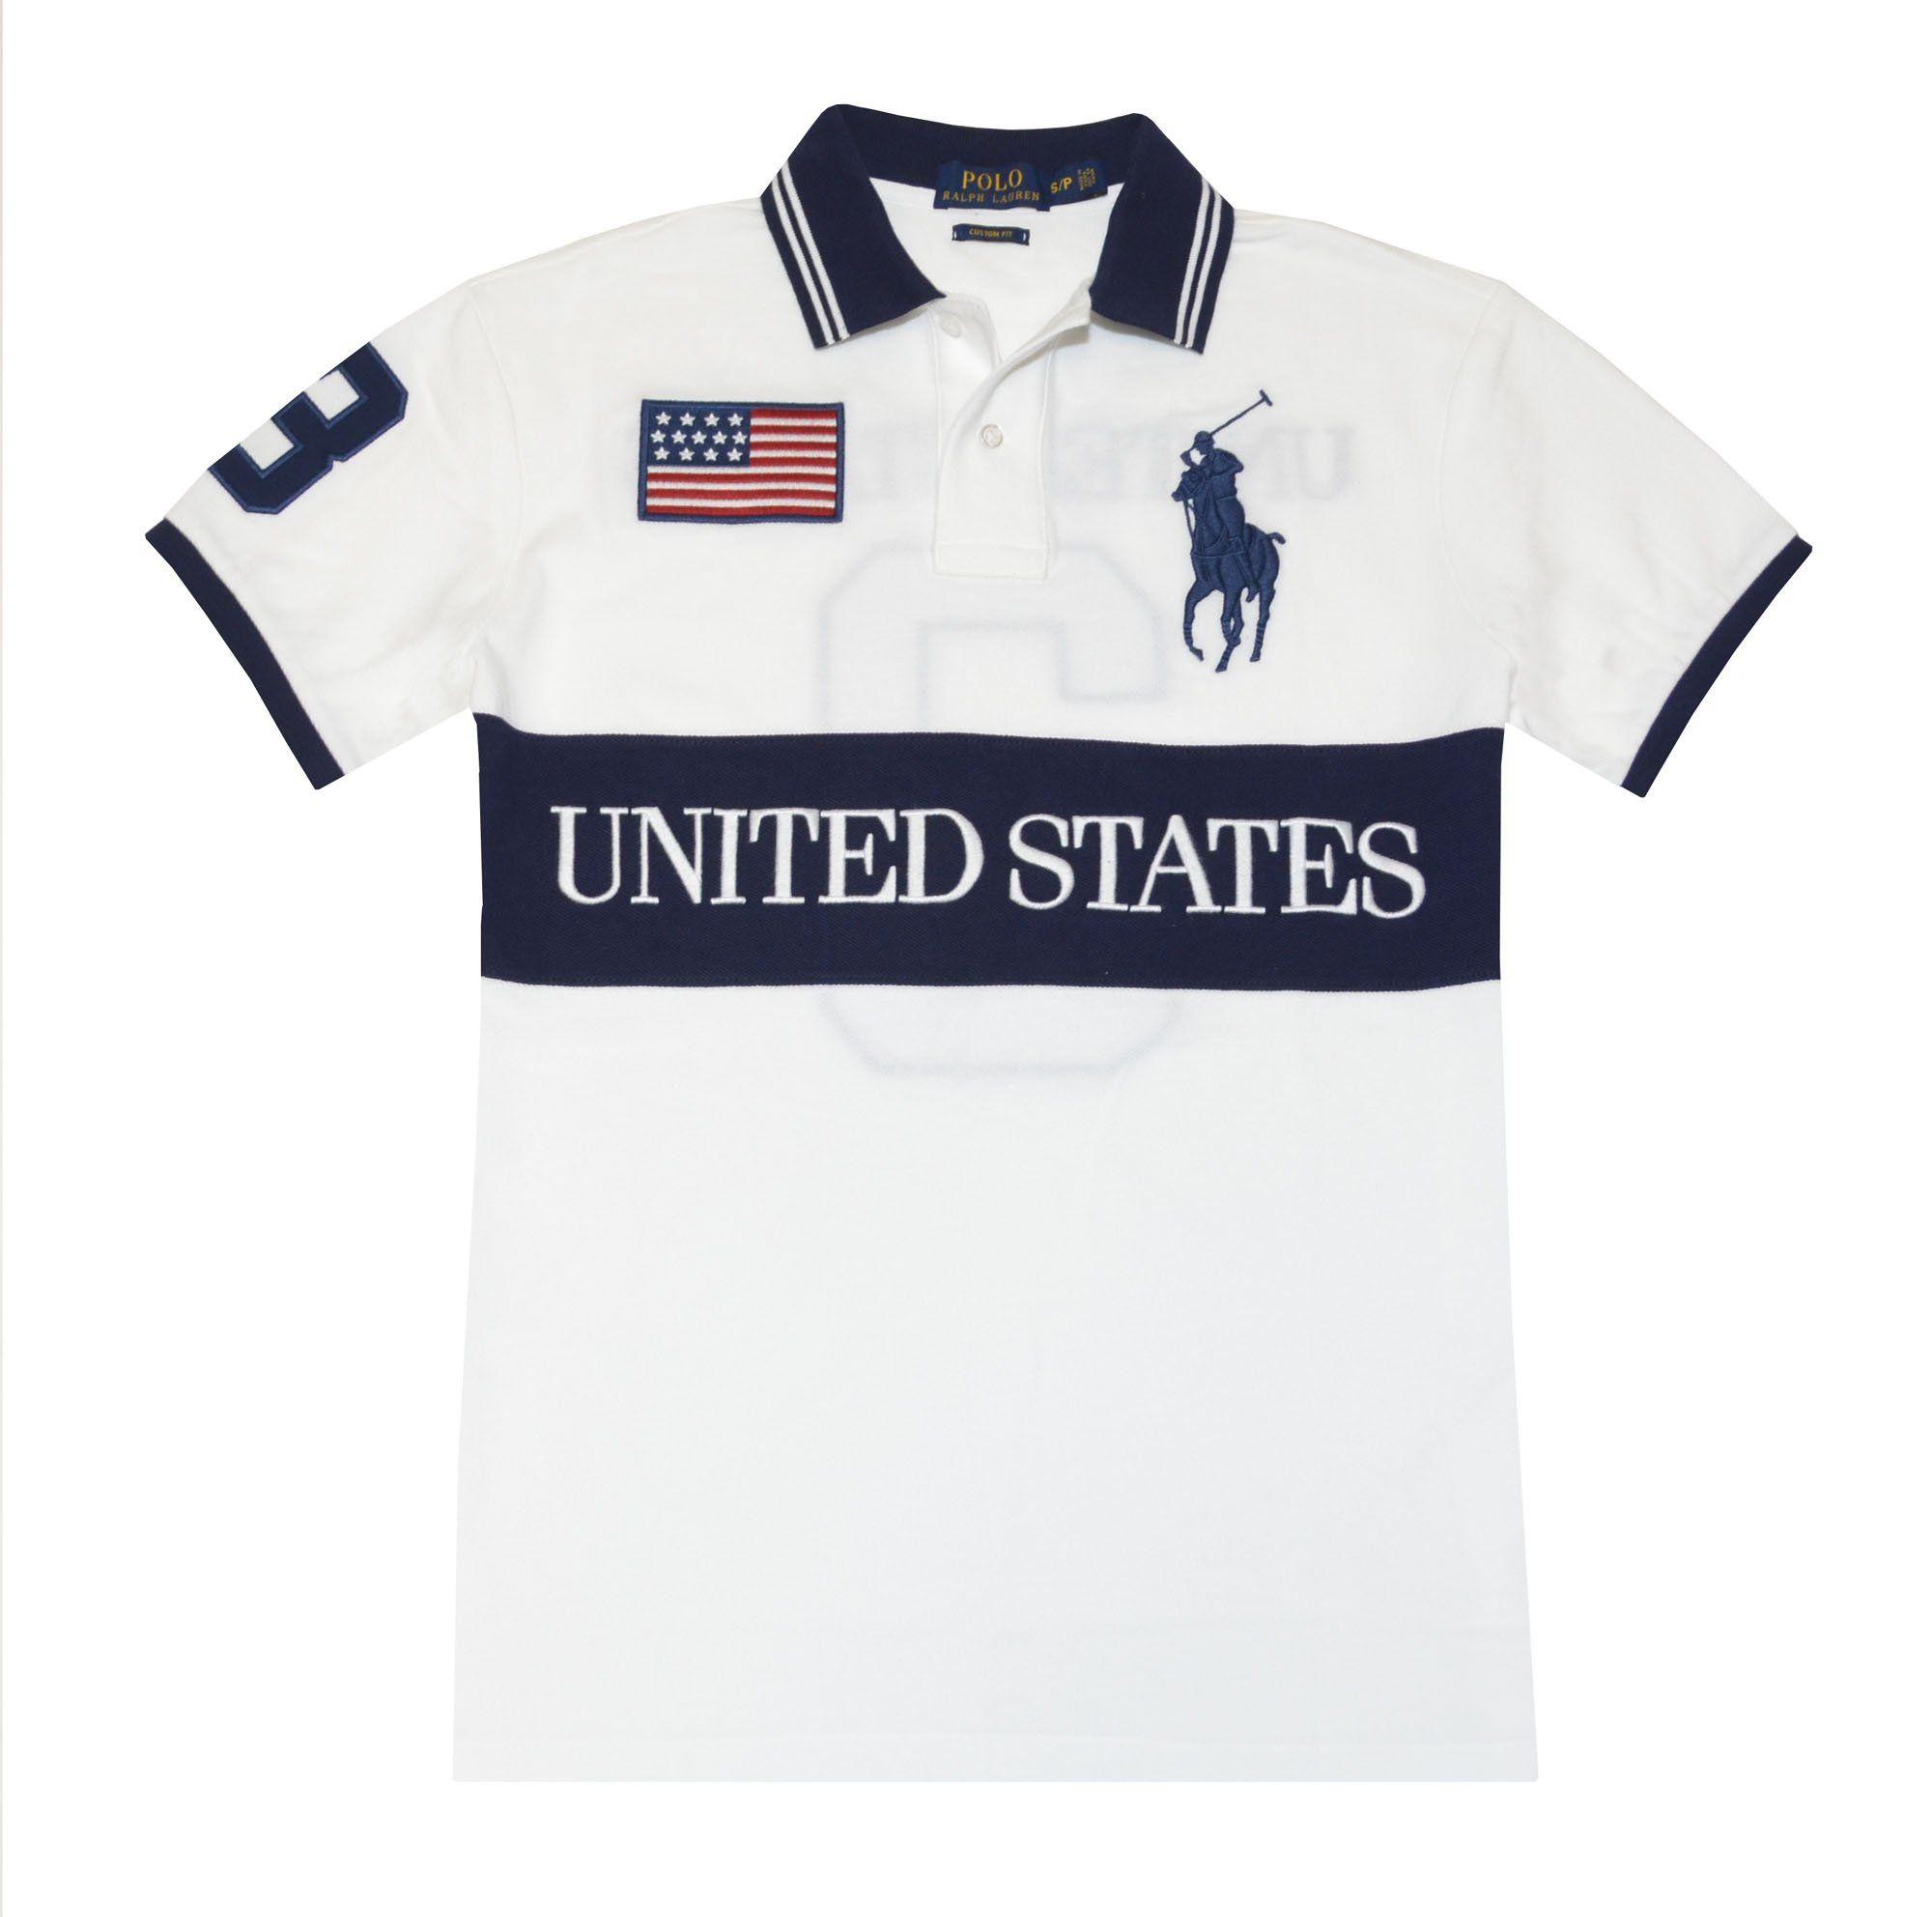 5d25debb1 ralph lauren polo tops for ladies boys ralph lauren polo shirts lot